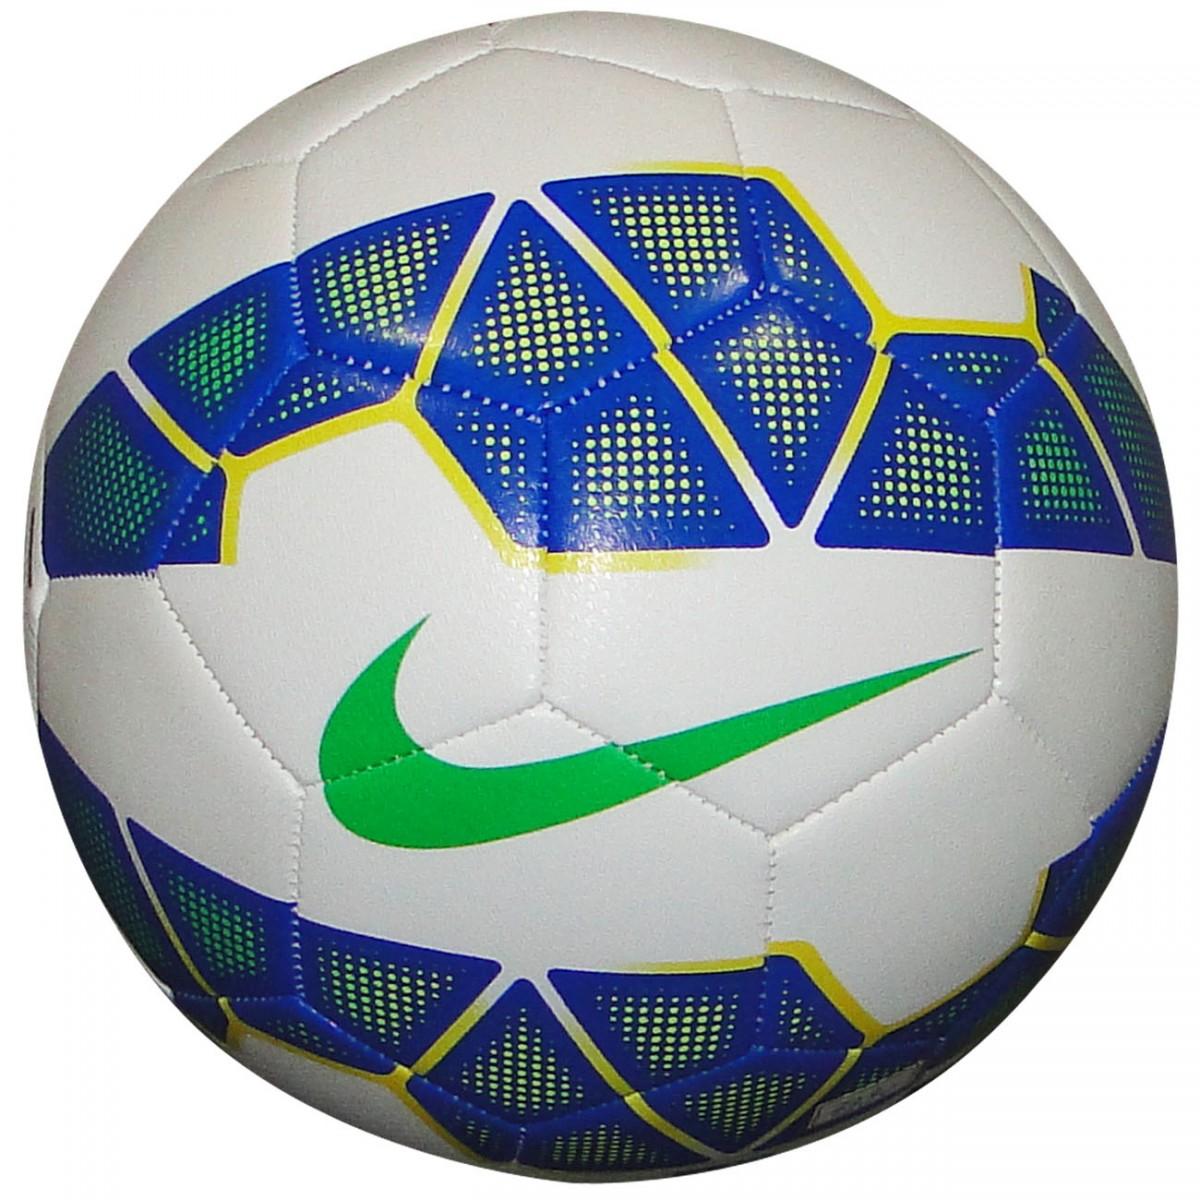 592707e1a6f6c Bola Nike Strike Brasileirão 2015 SC2600-143 - Branco Azul - Chuteira Nike